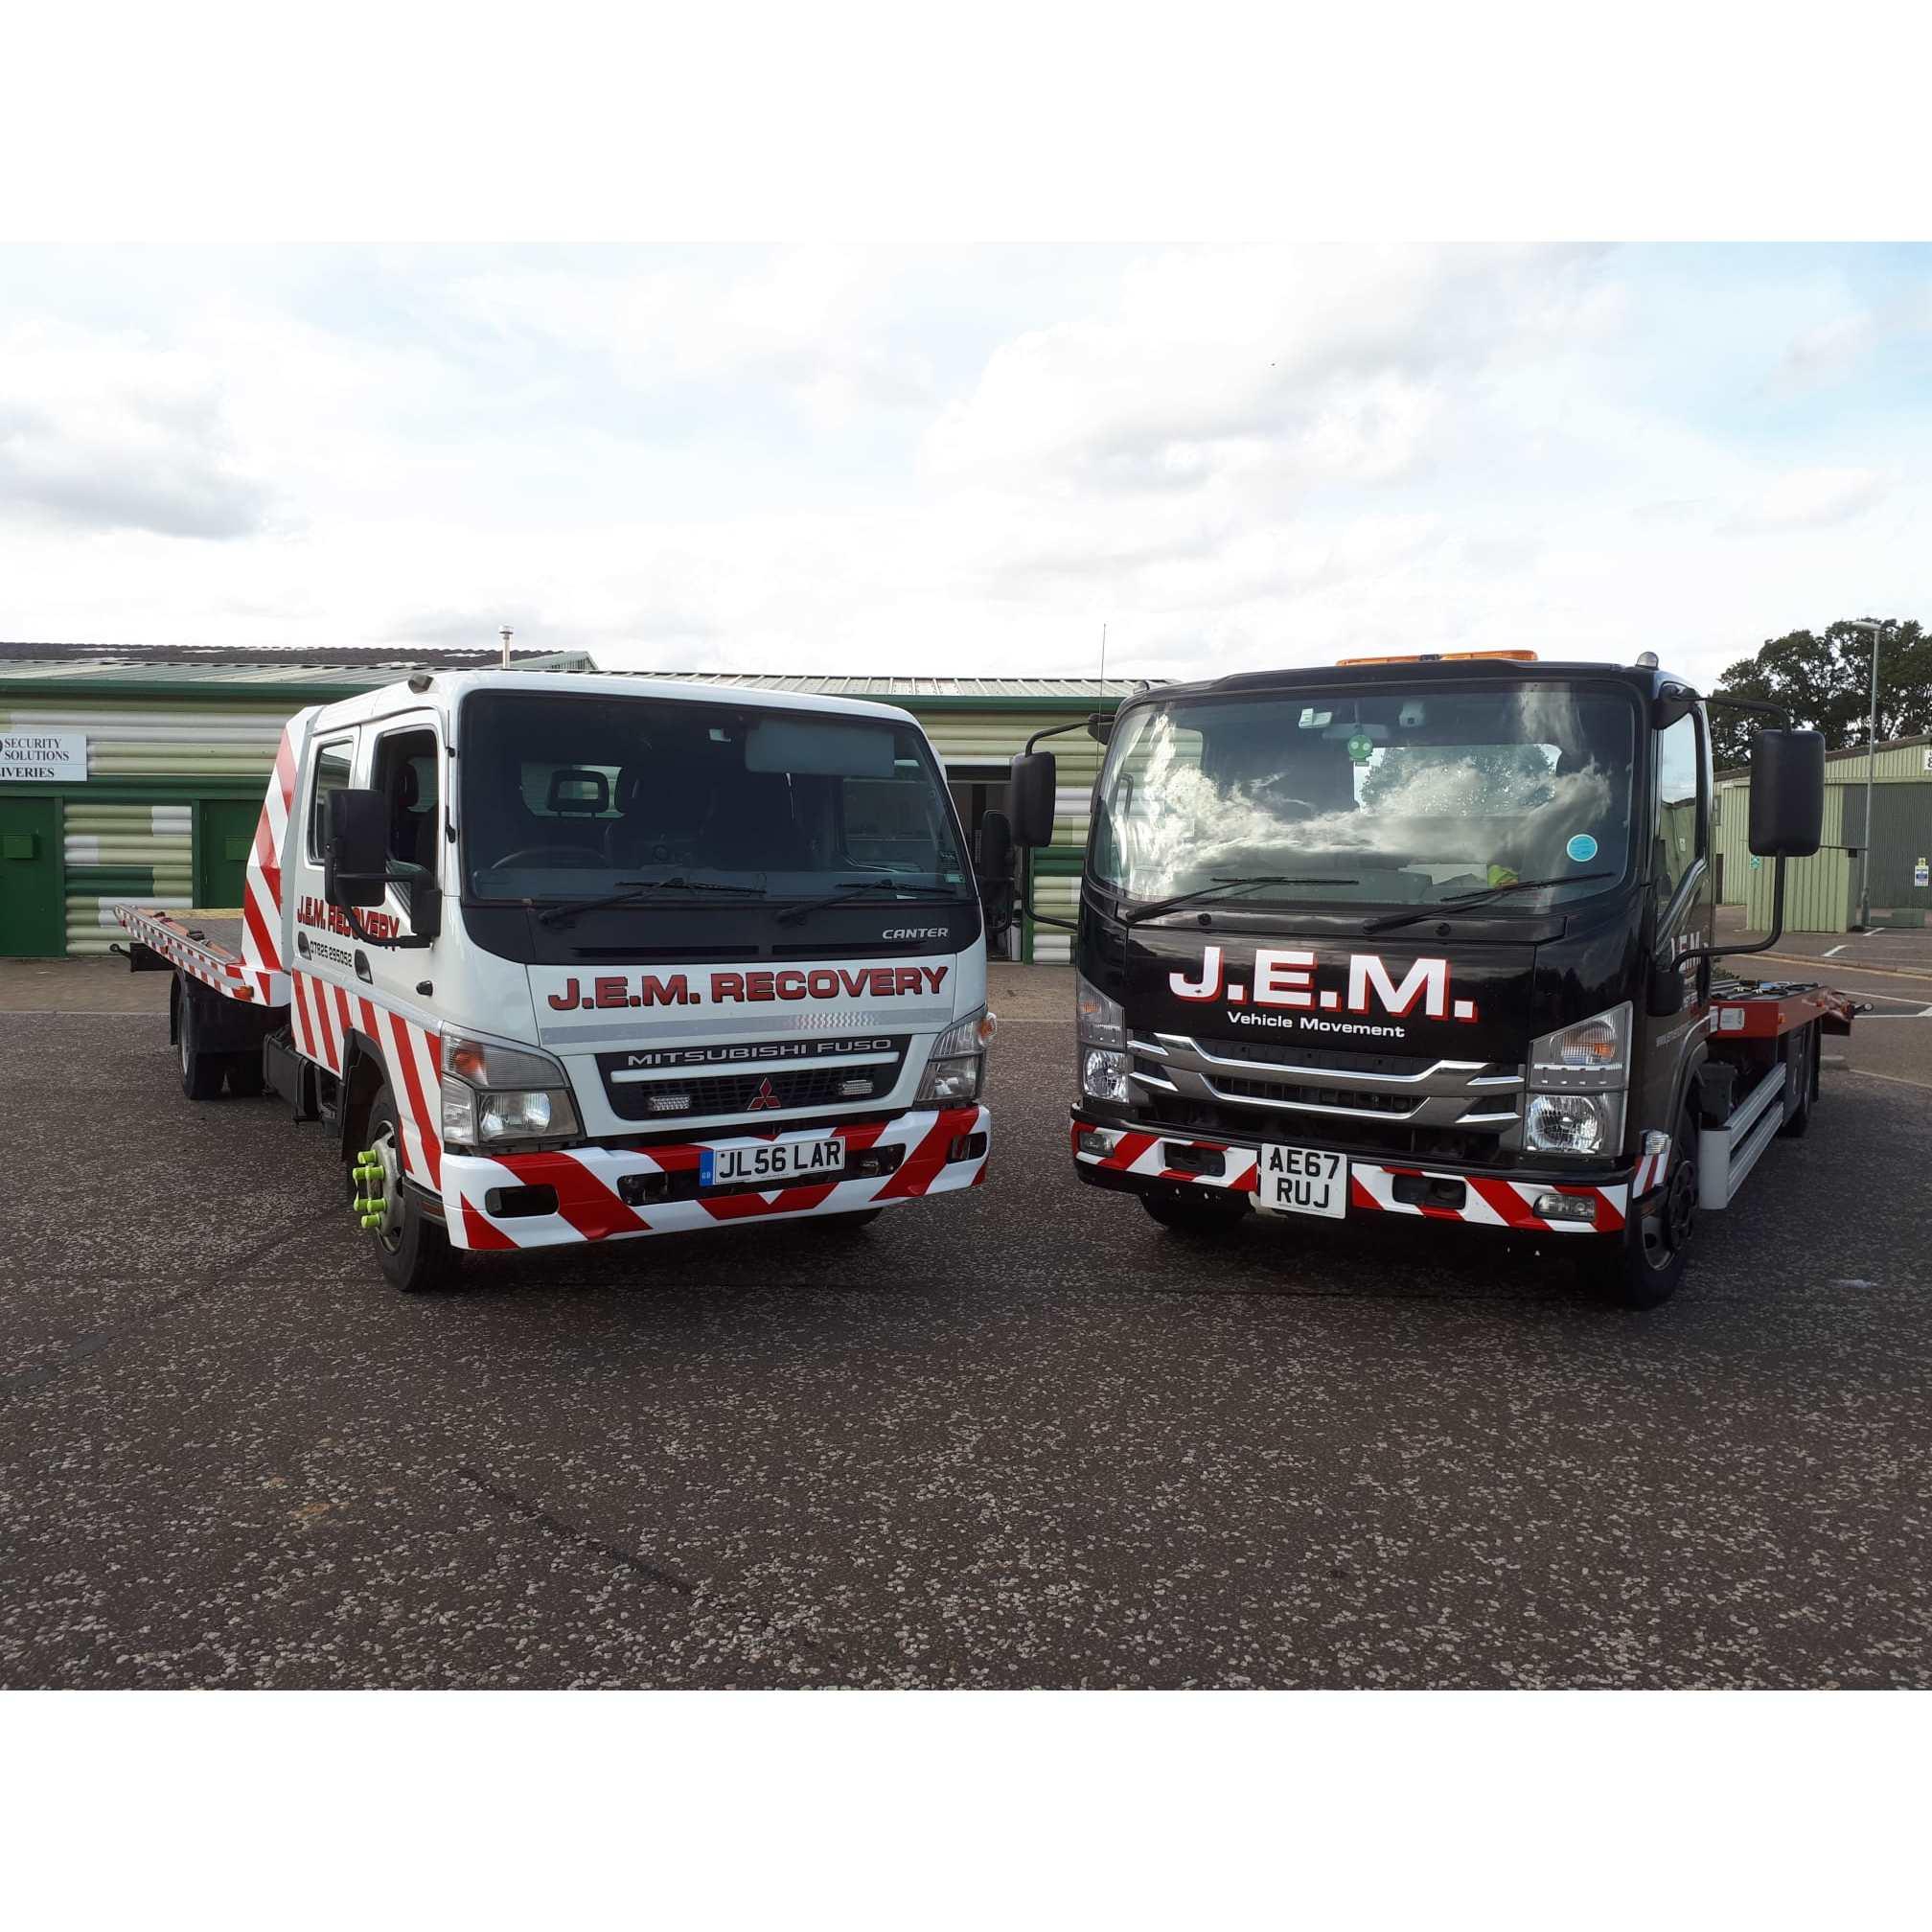 J.E.M. Breakdown & Recovery - Beccles, Essex NR34 7TD - 07825 295052 | ShowMeLocal.com